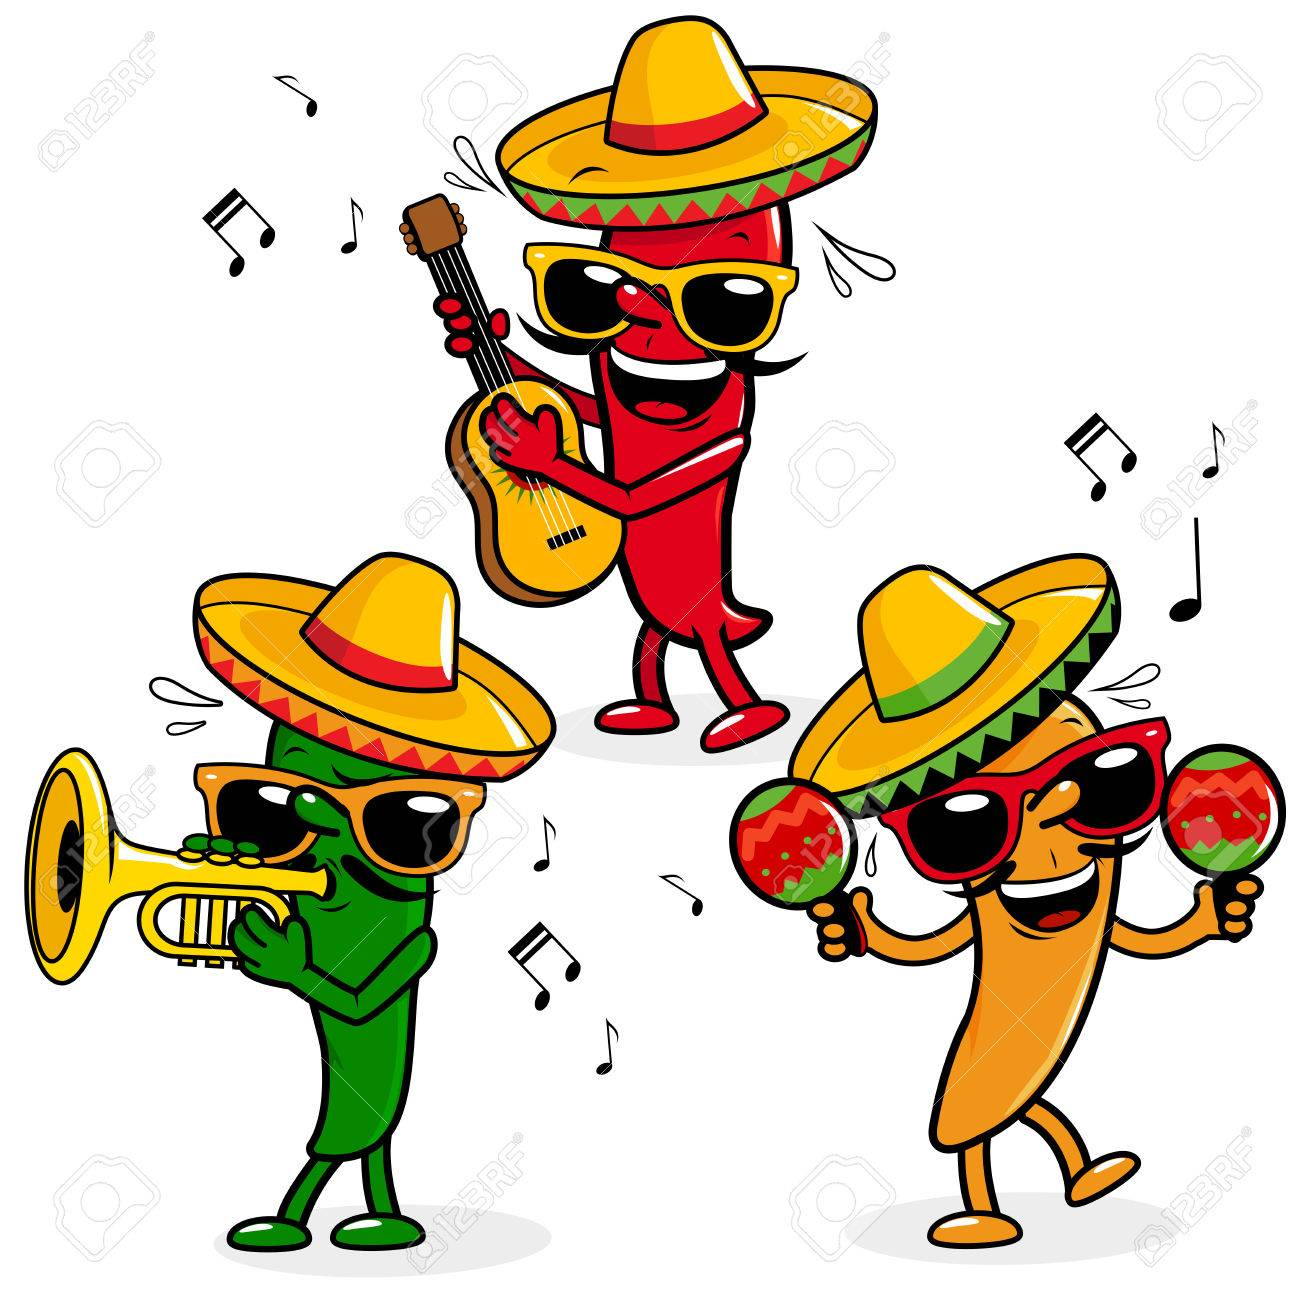 Cartoon hot mariachi peppers - 63583981